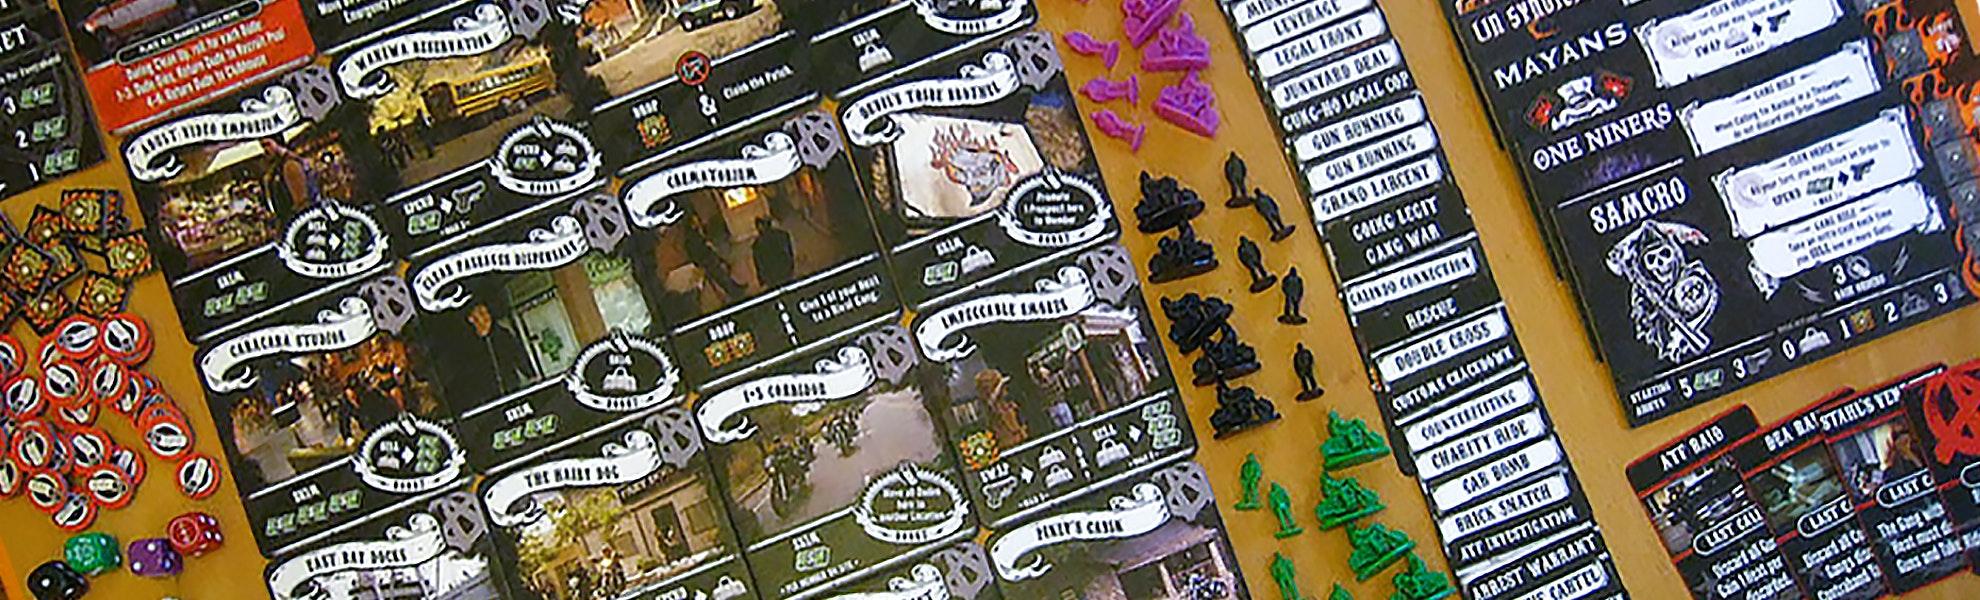 Sons of Anarchy: Men of Mayhem Board Game